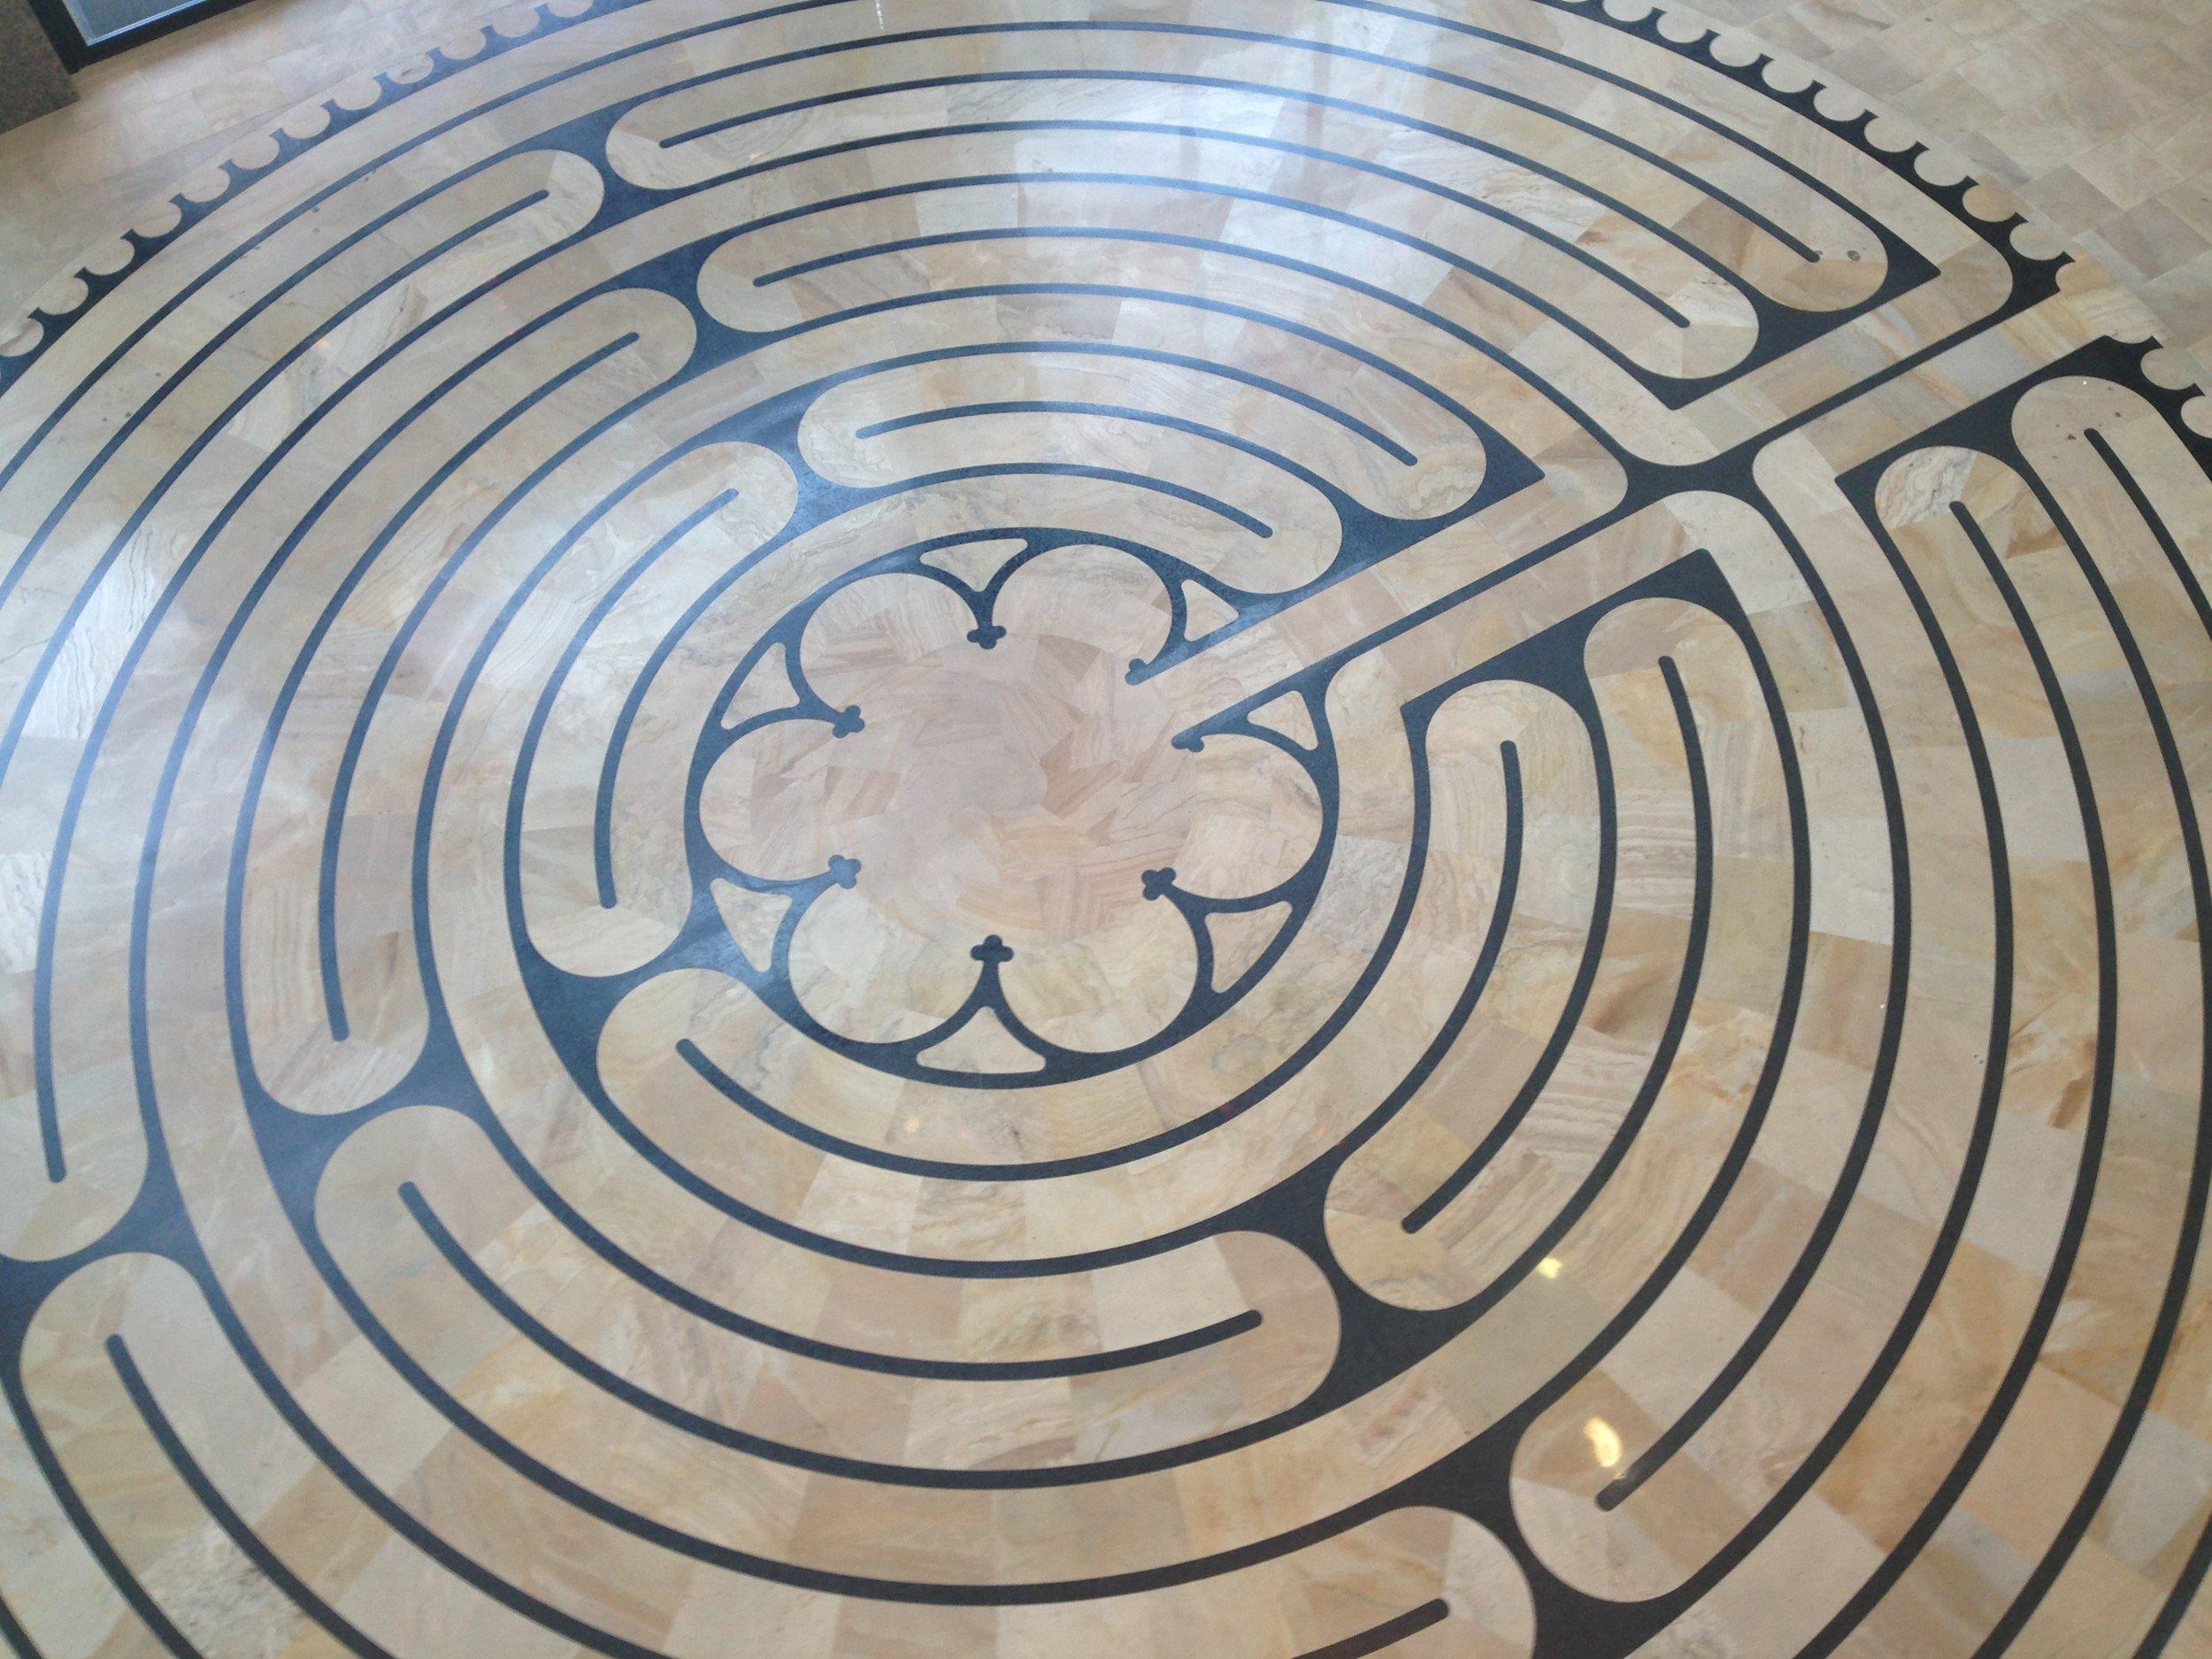 second labyrinth we walked in Denver